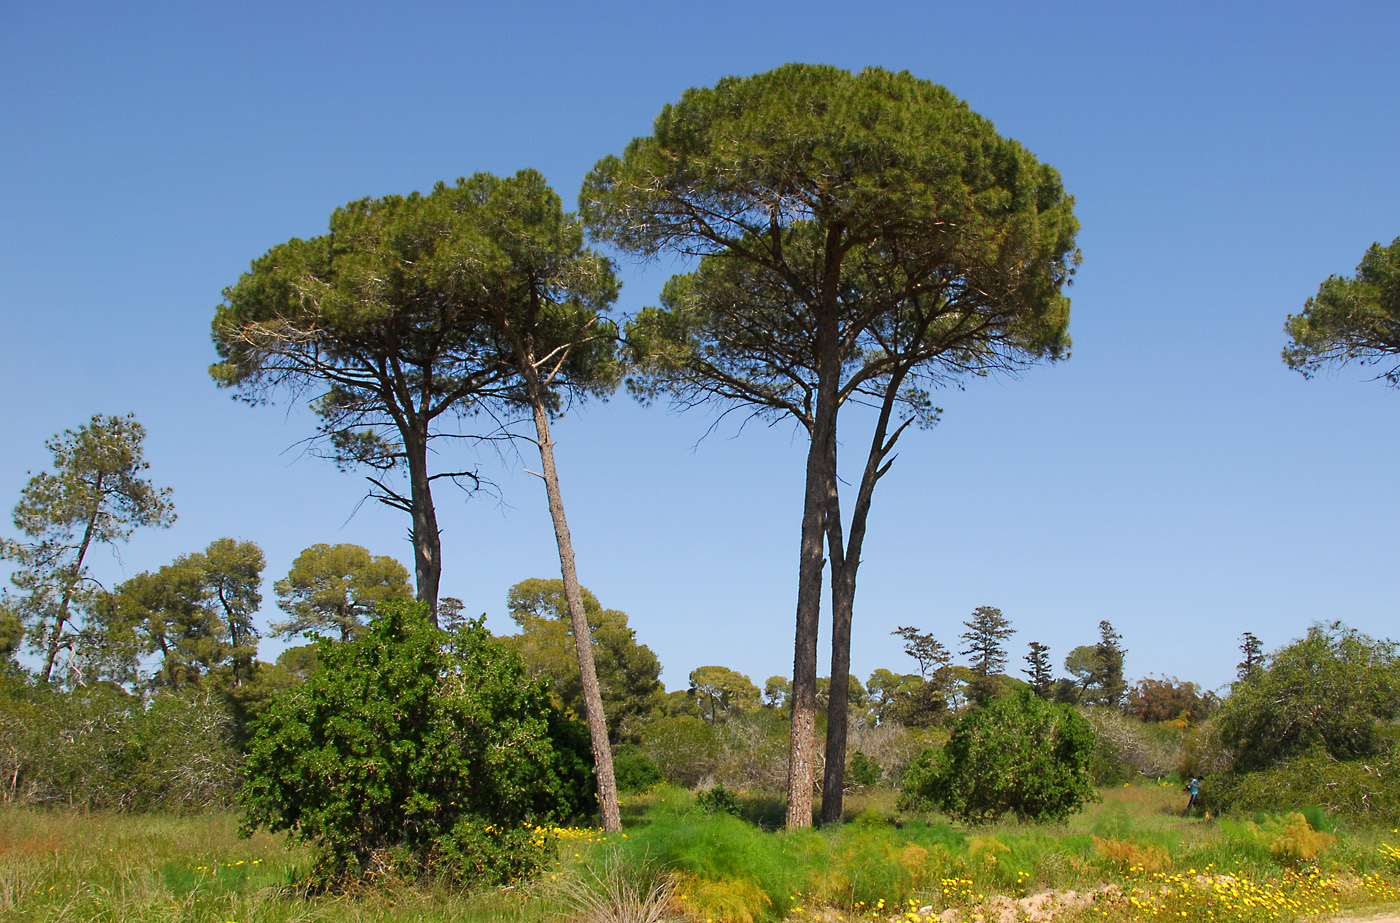 https://pictures.bgbm.org/digilib/Scaler?fn=Cyprus/Pinus_pinea_A1.jpg&mo=file